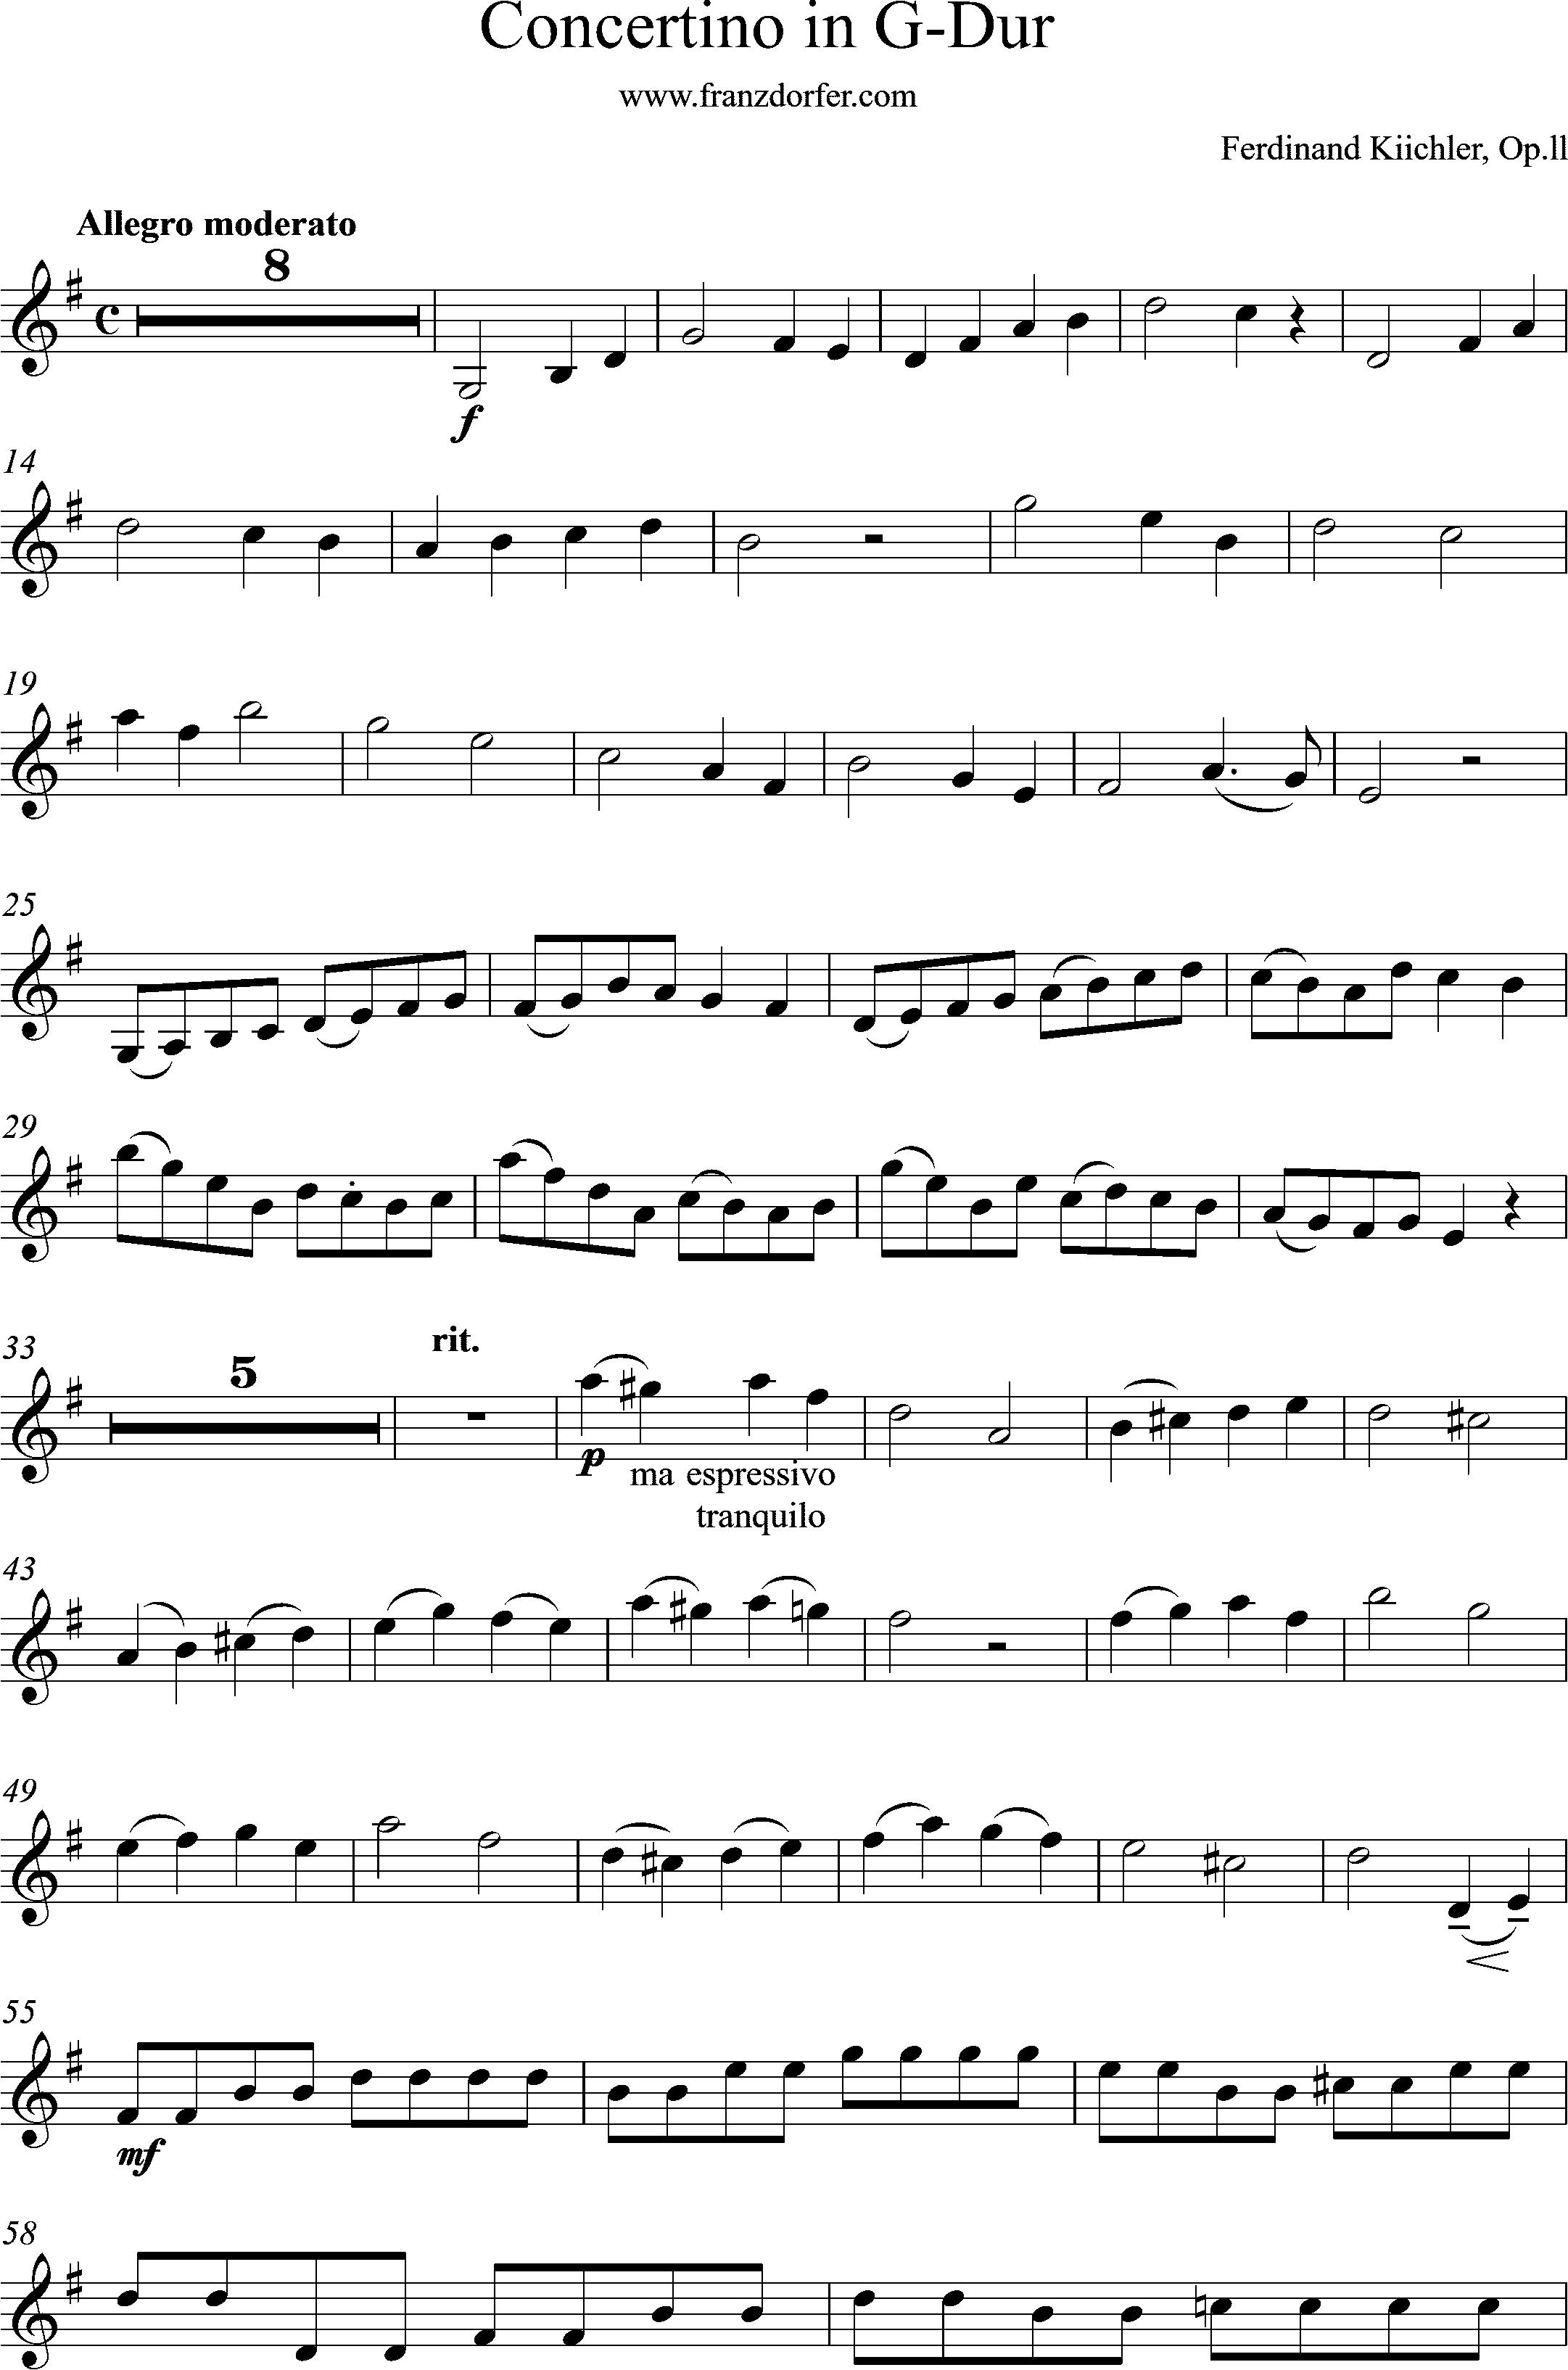 Solopart Küchler Concertino in G